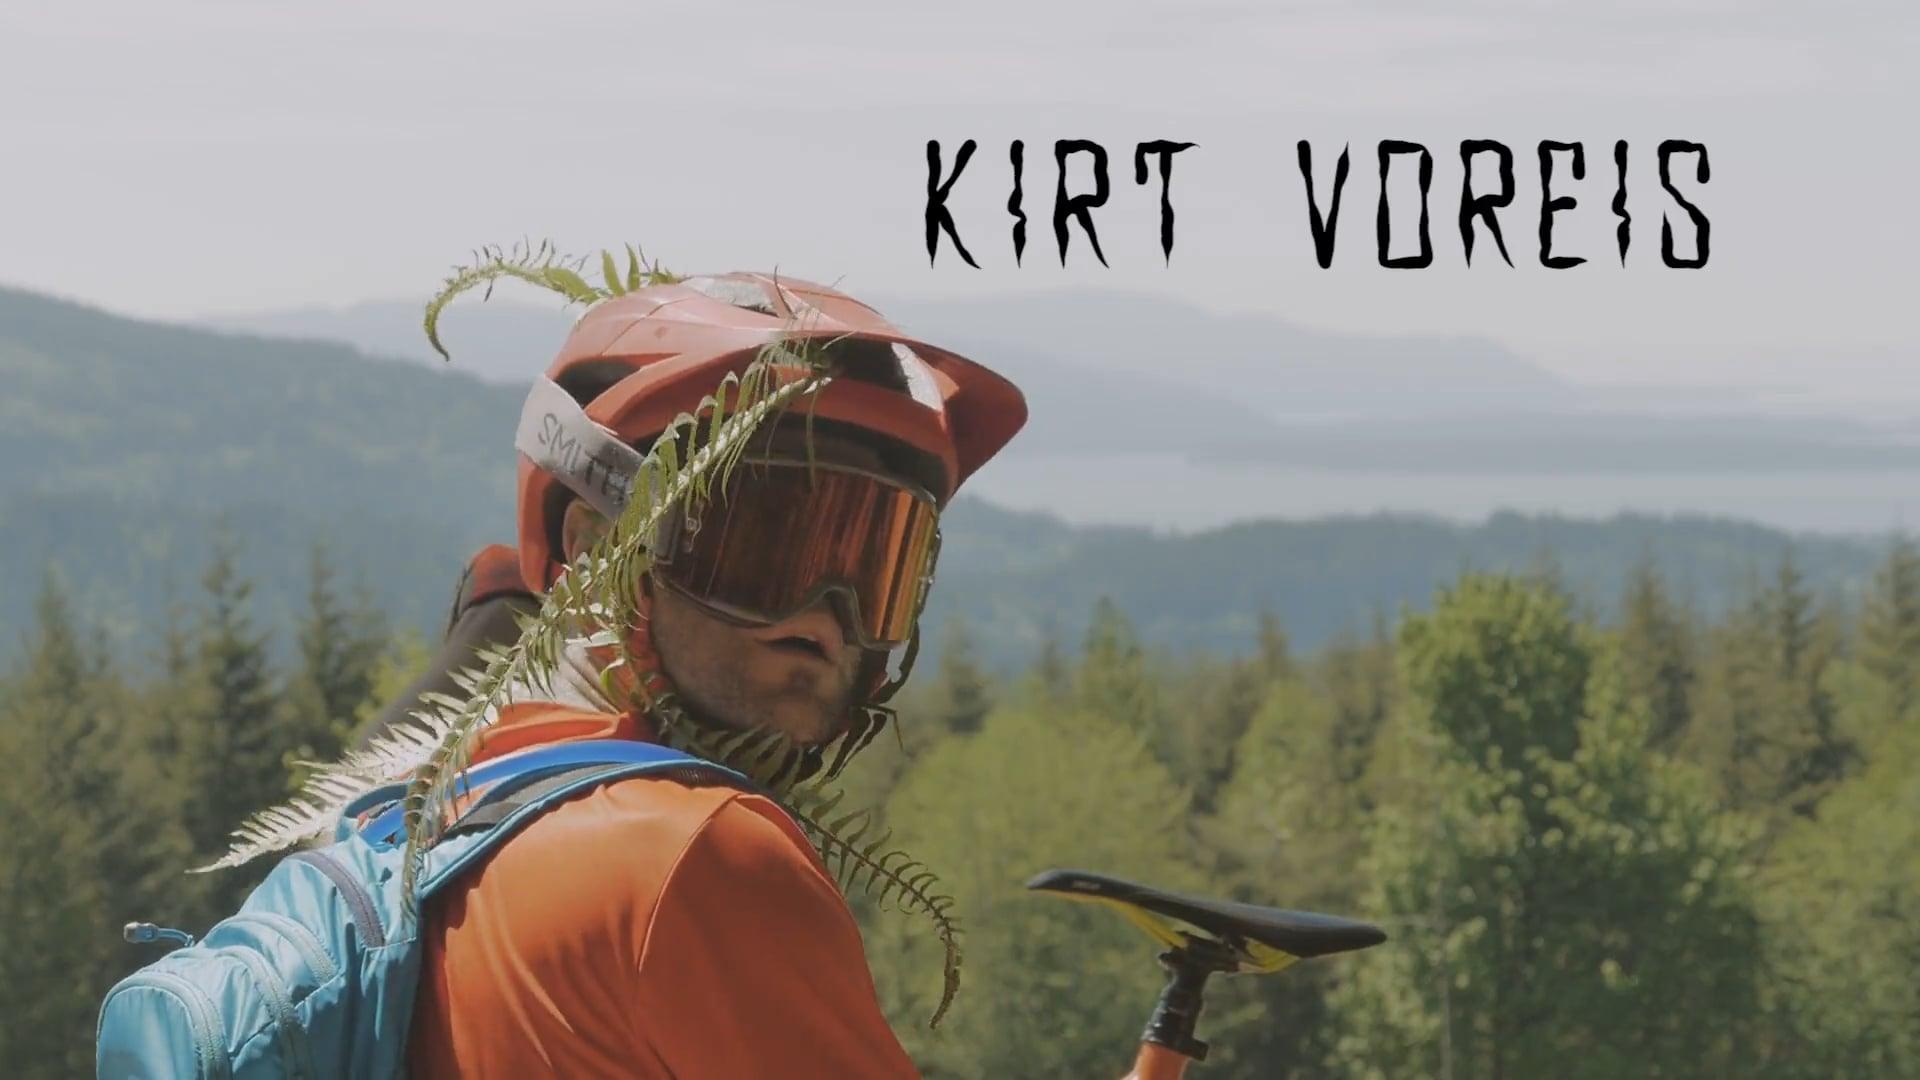 Kirt Voreis: Galbraith Mountain